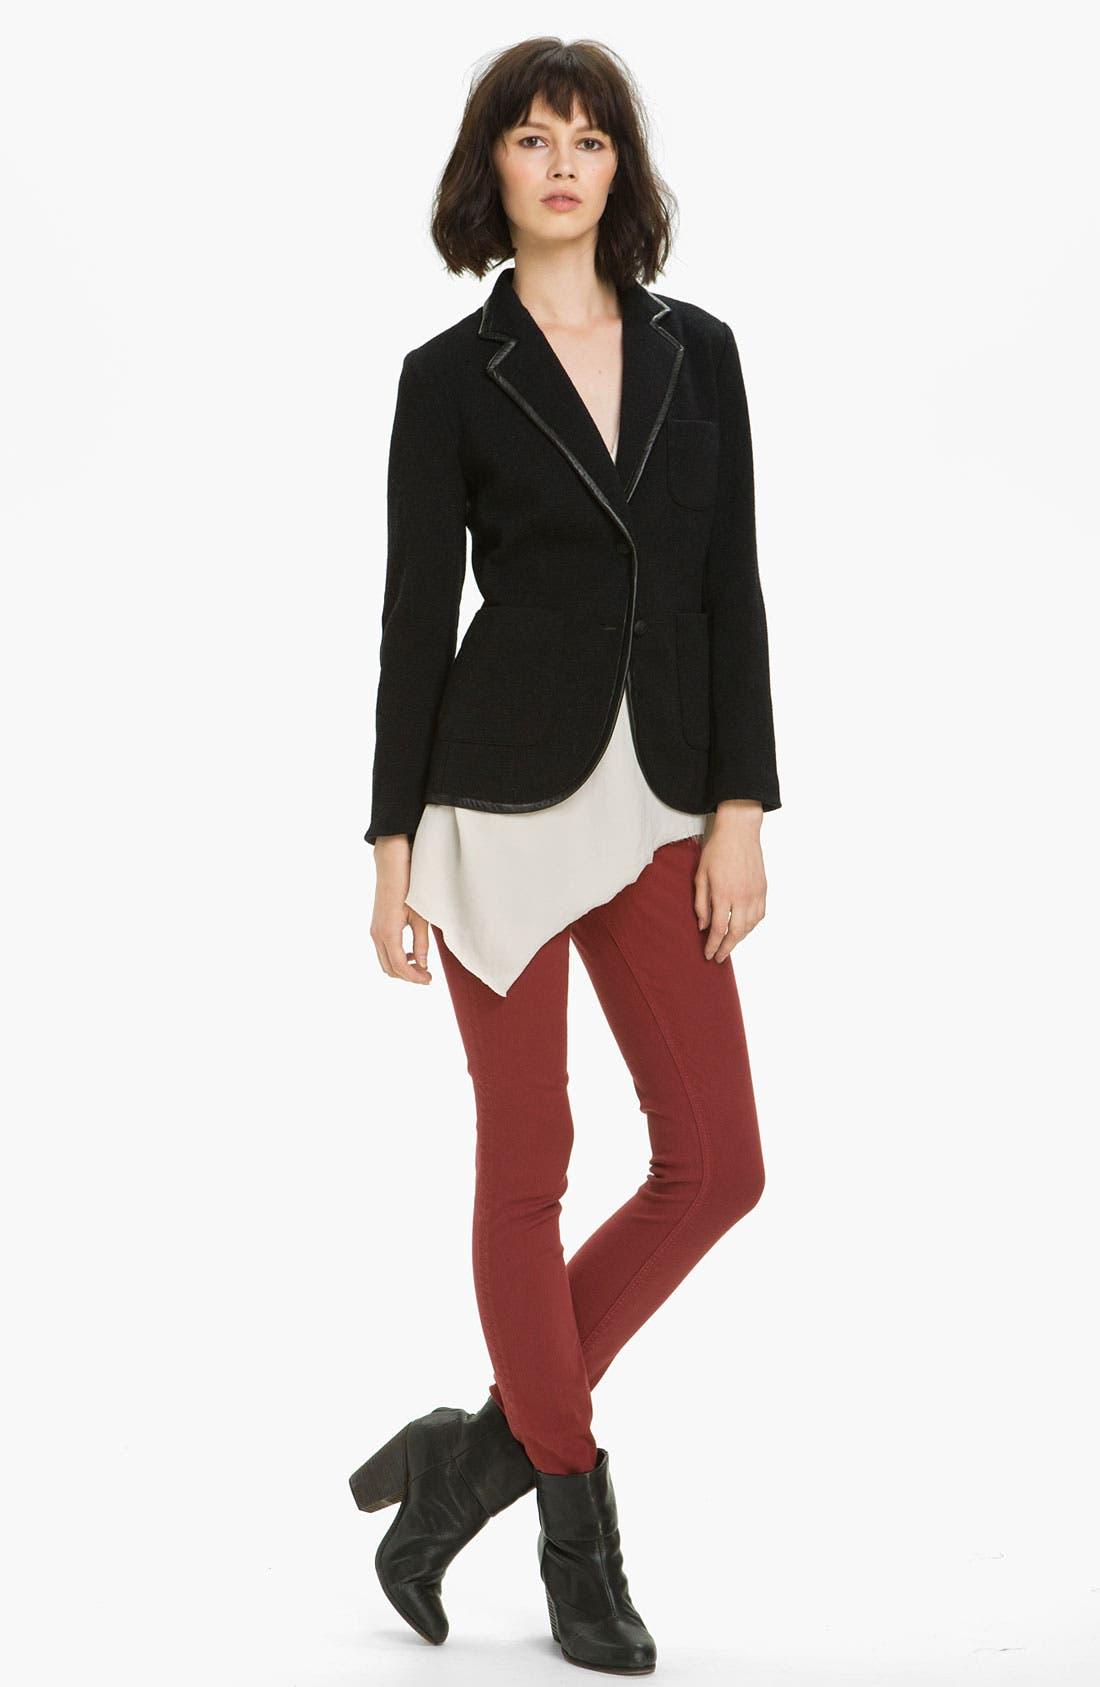 Alternate Image 1 Selected - rag & bone 'Bromley' Leather Trim Knit Blazer